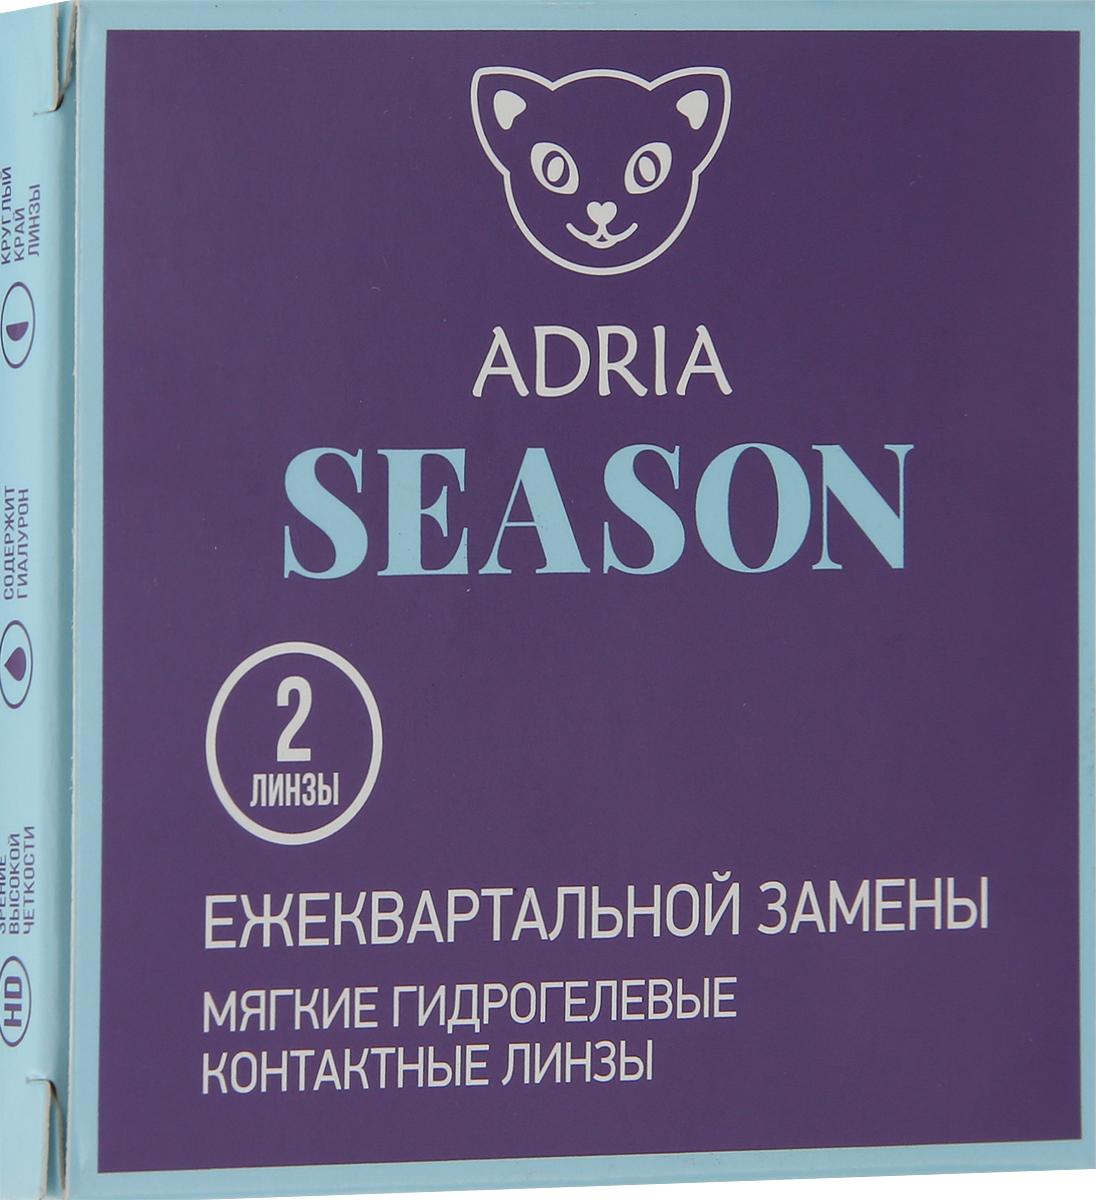 Adria Контактные линзы Morning Q38 / 2 шт / -1.00 / 8.6 / 14